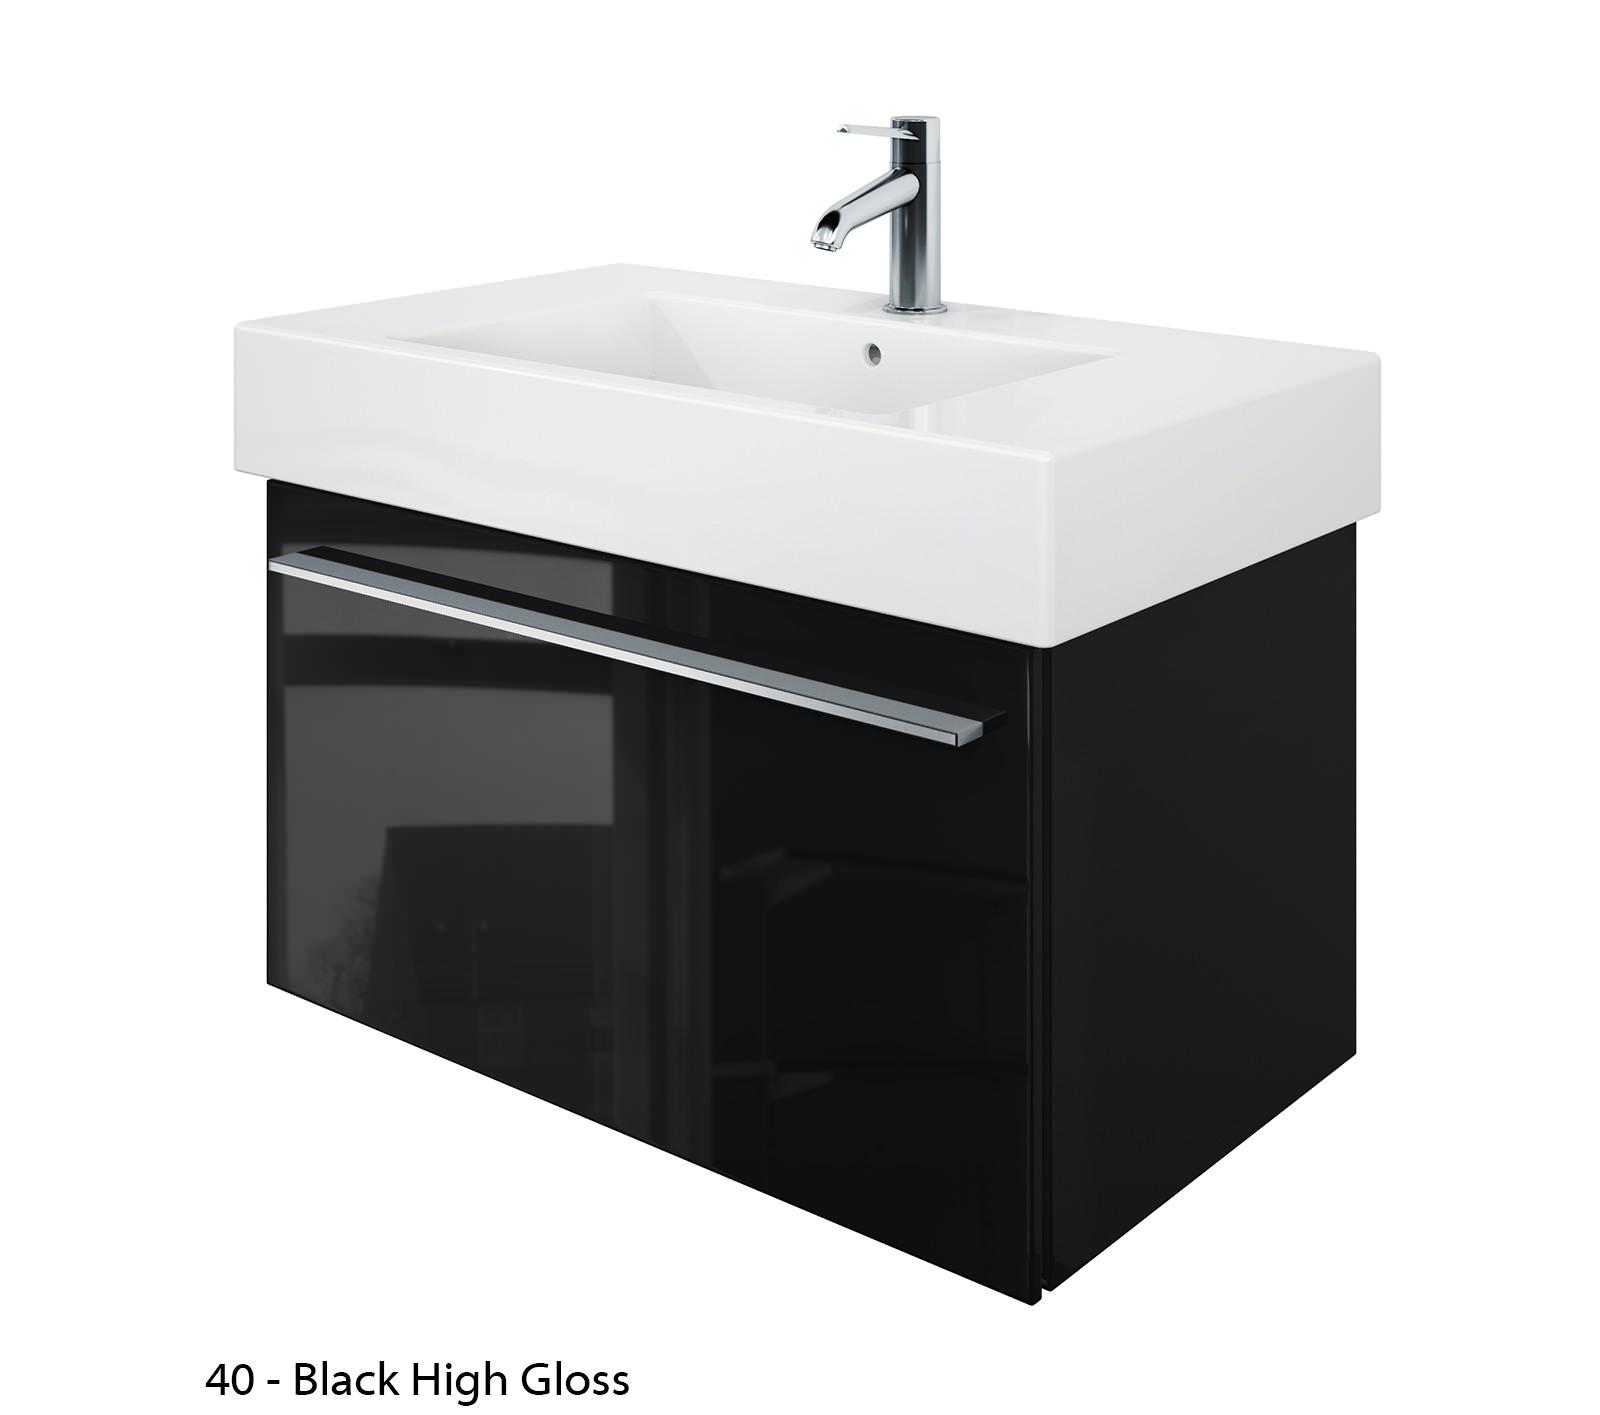 duravit x large 800mm vanity unit with 850mm vero washbasin xl605201818. Black Bedroom Furniture Sets. Home Design Ideas